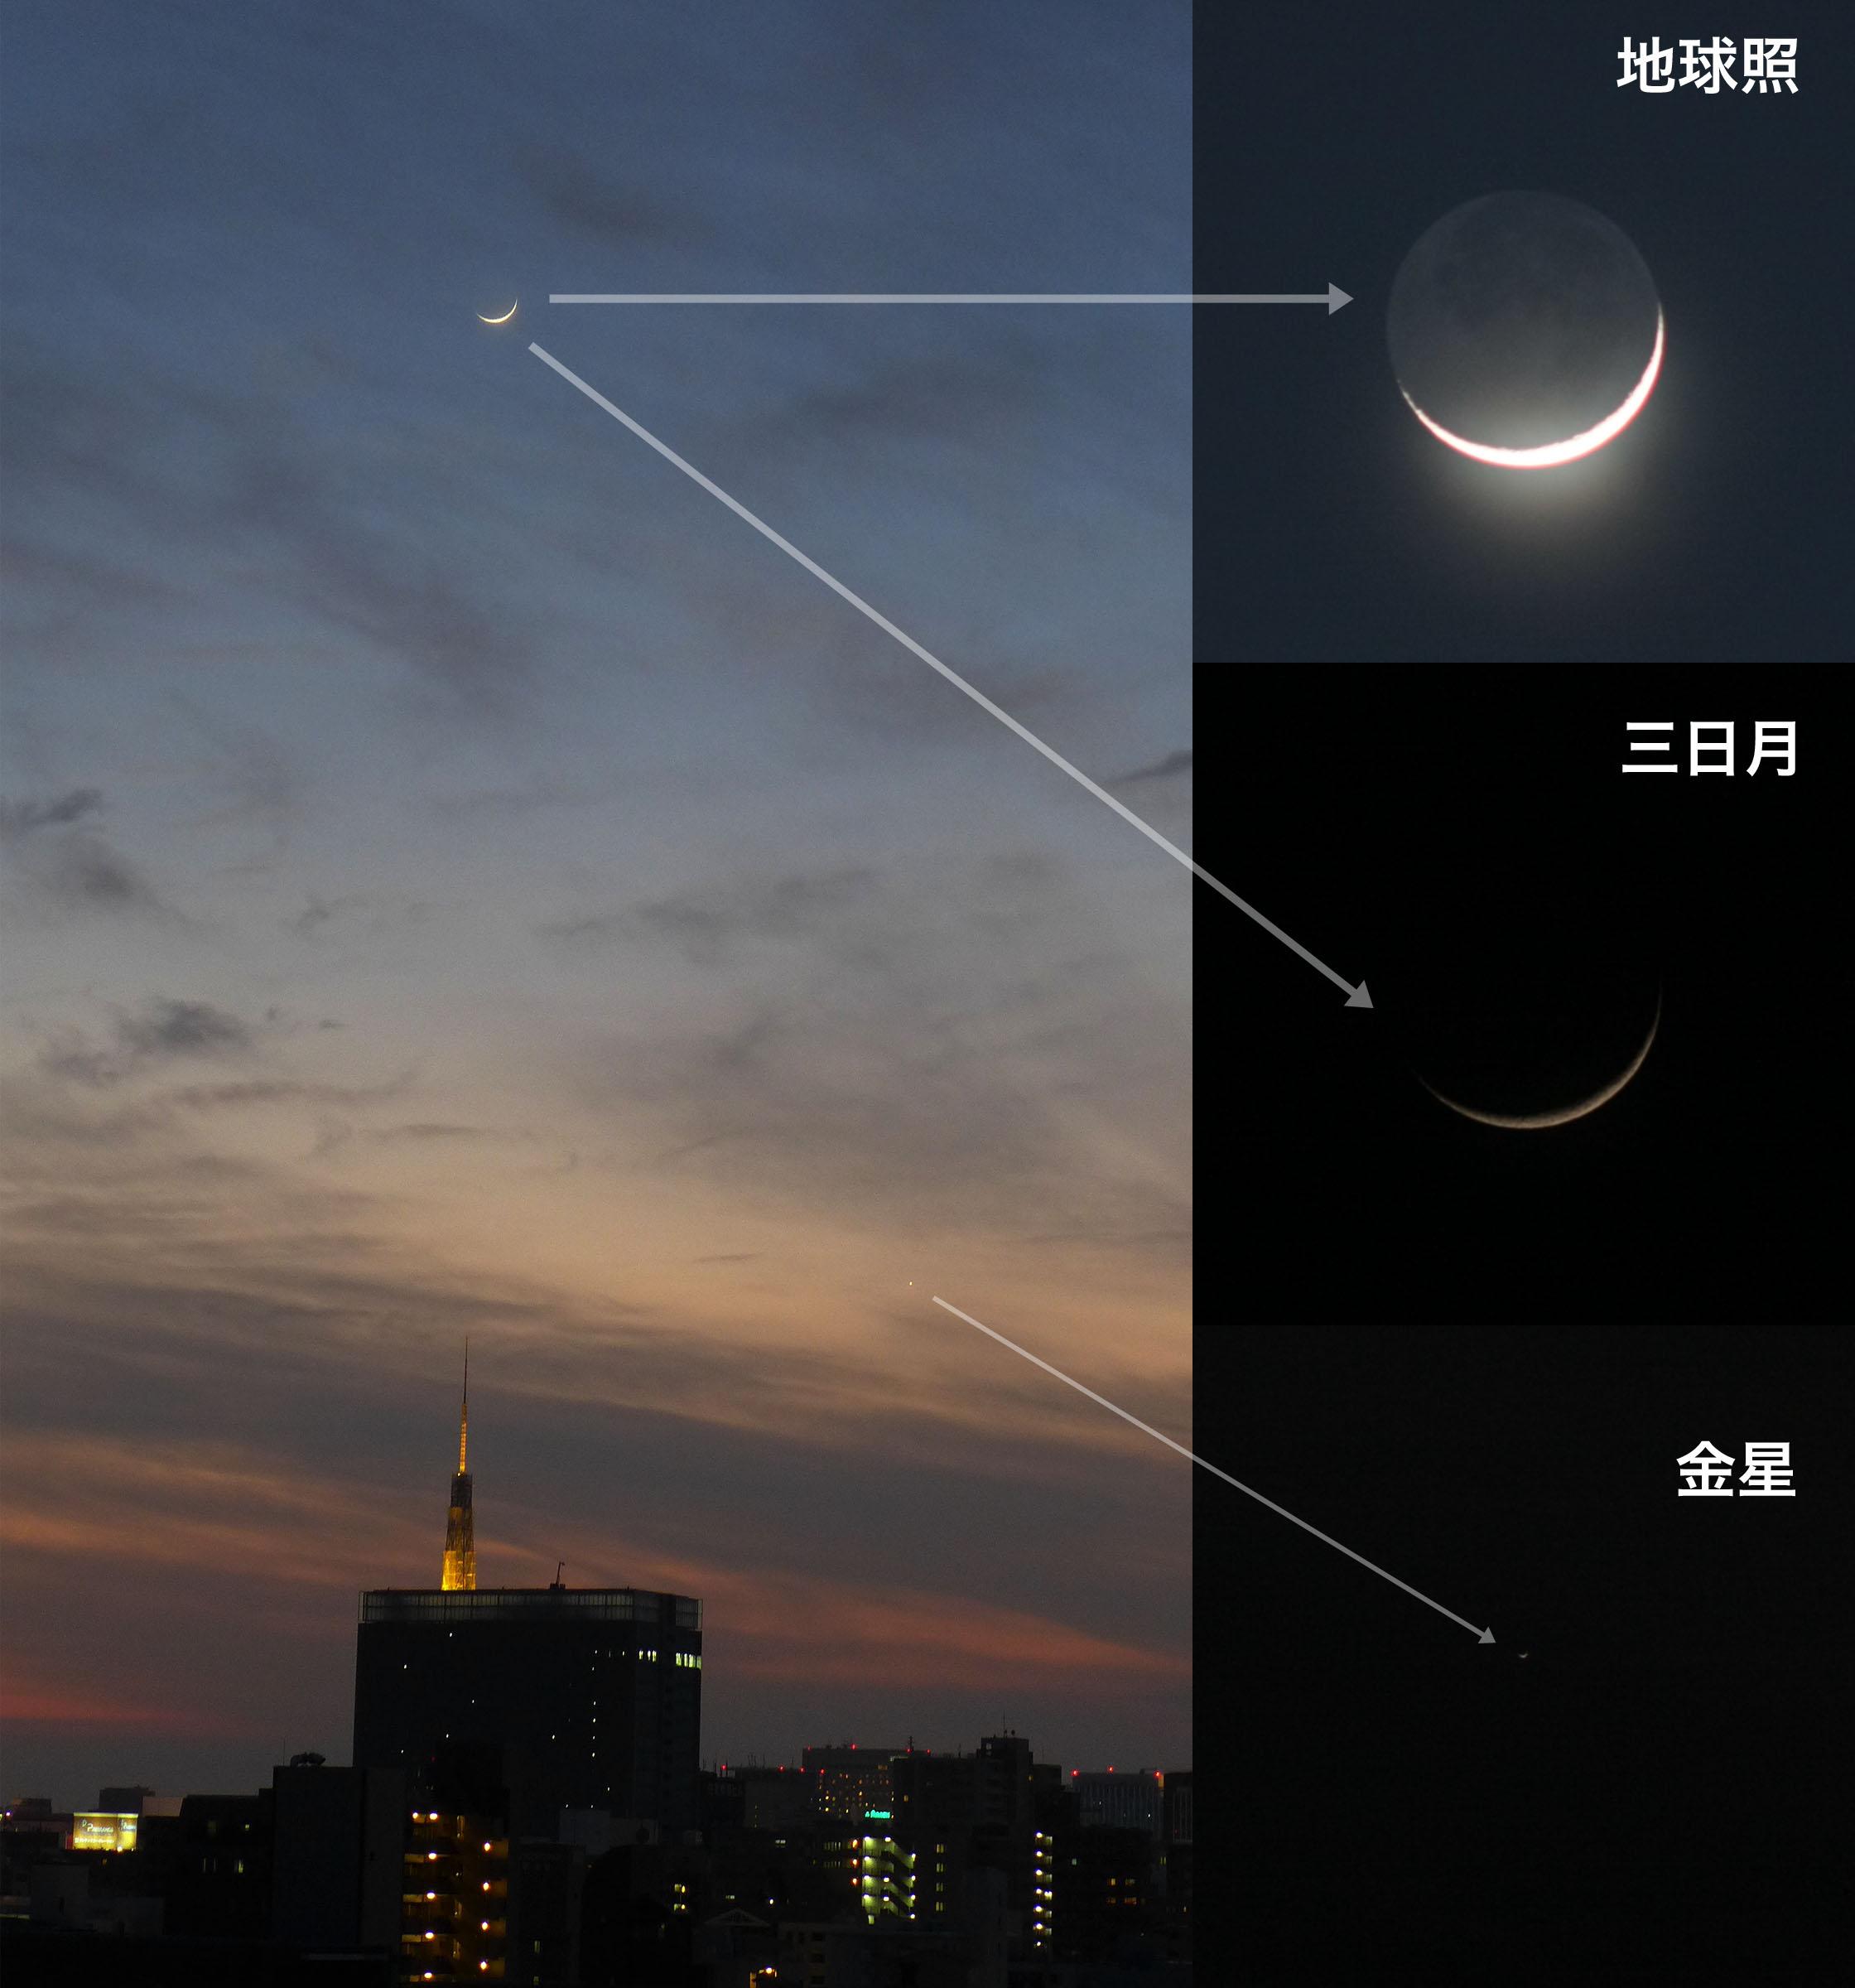 http://www.ncsm.city.nagoya.jp/study/astro/P1070914_%E5%90%88%E6%88%90.jpg